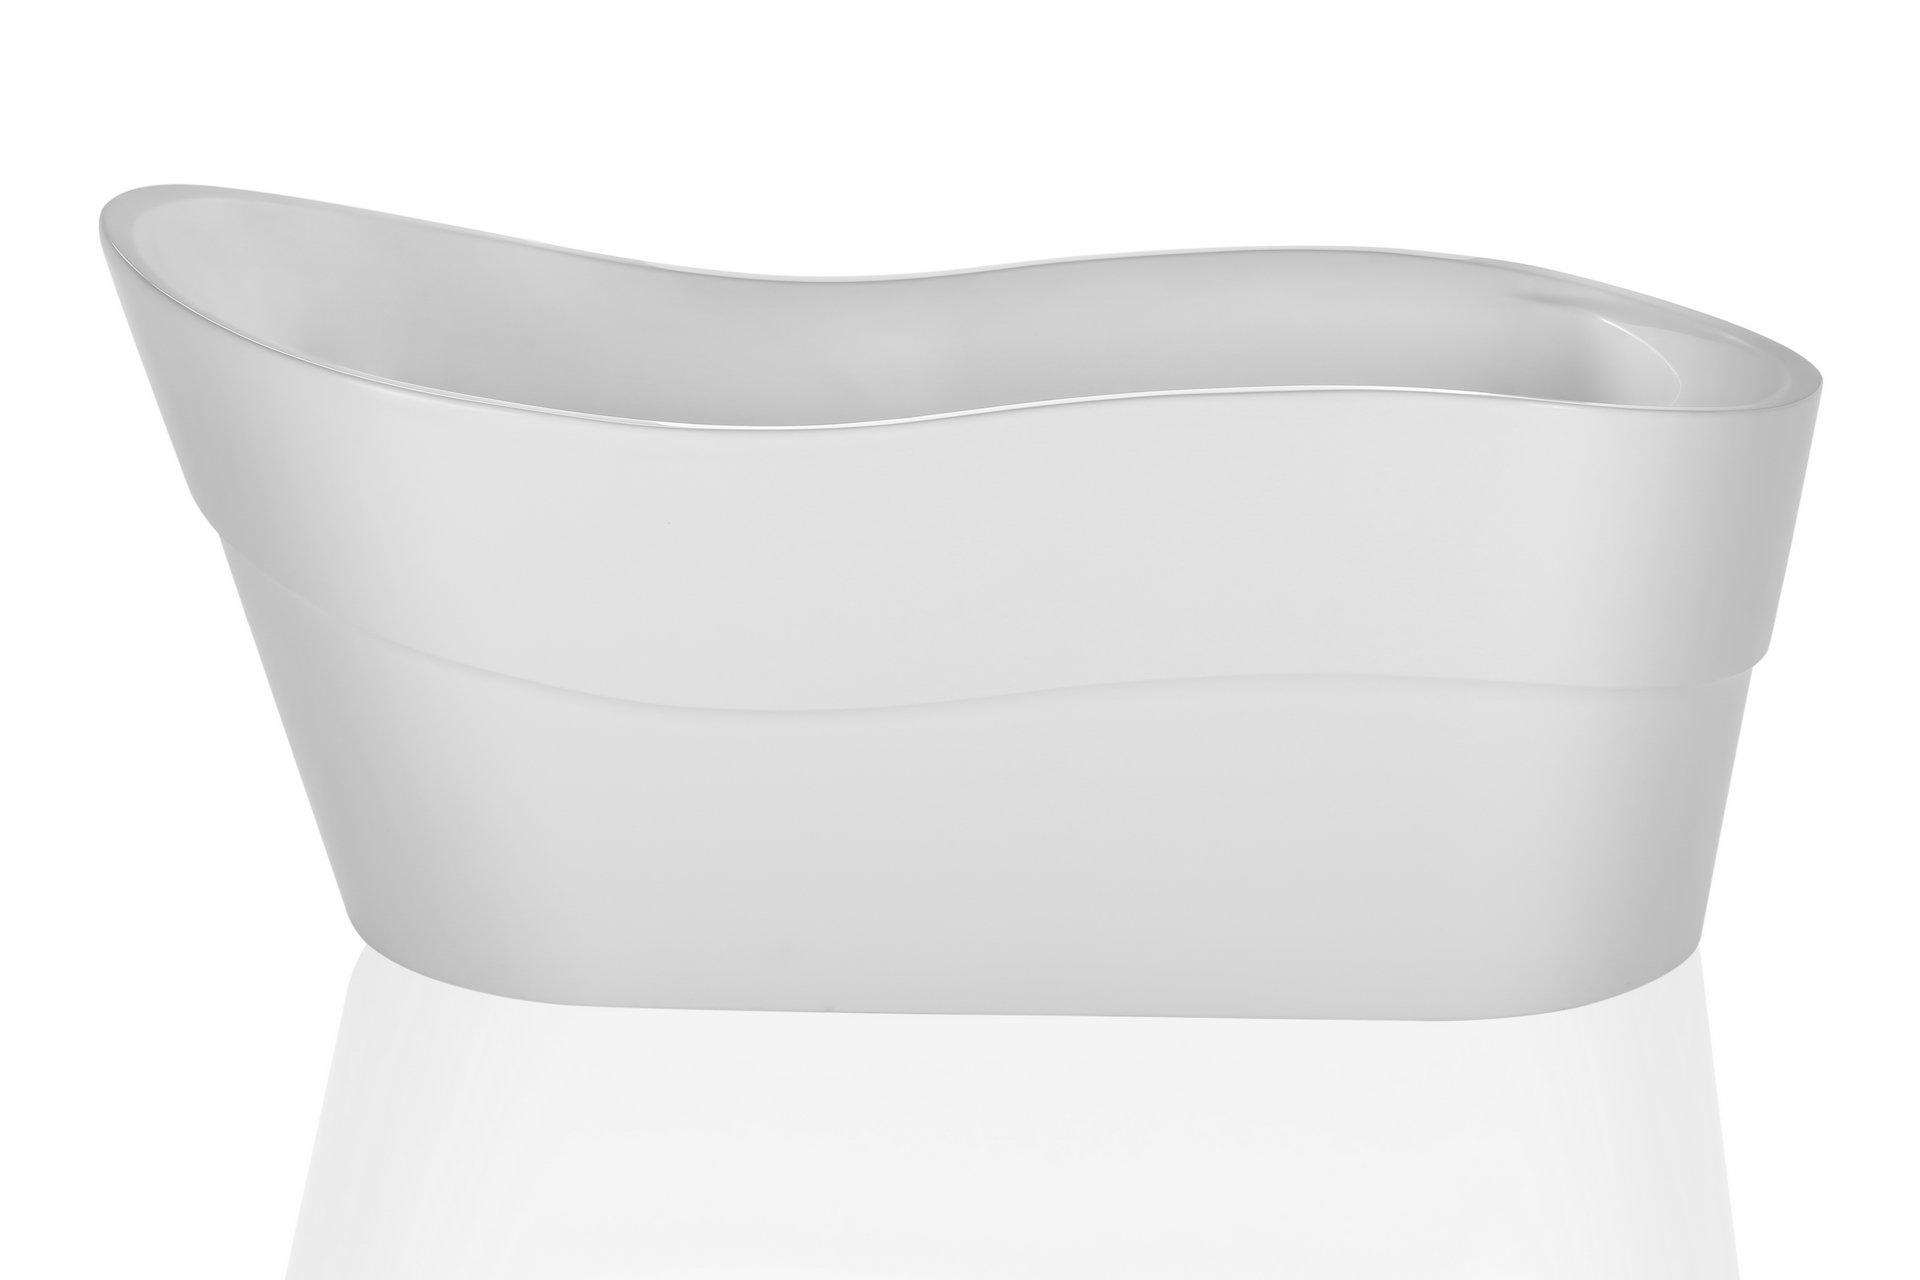 Empava A1527W Luxury Modern Bathroom Freestanding Bathtub, White